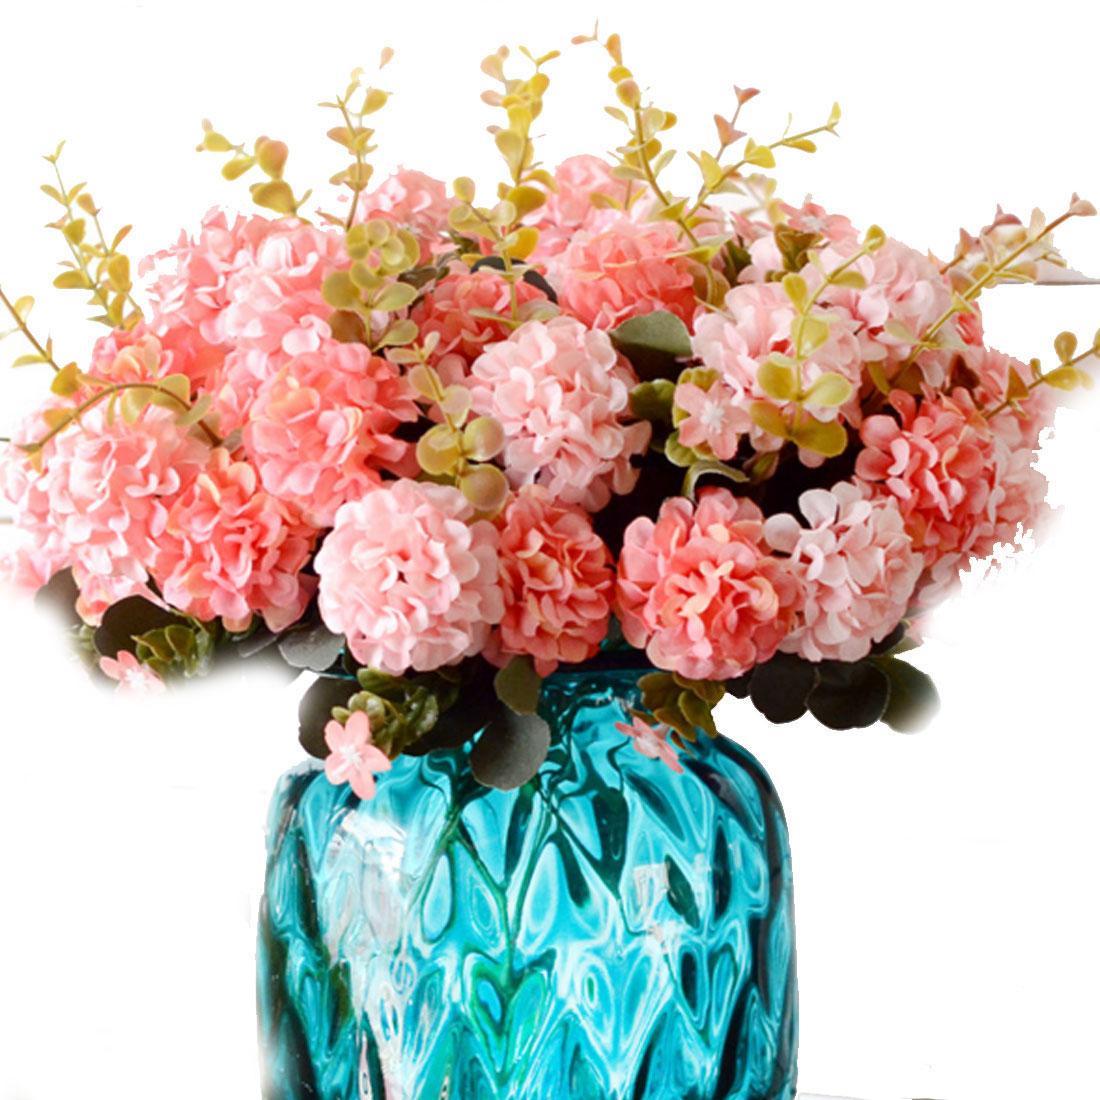 Home Floral Decor: Bouquet Flower Artificial Chrysanthemum Wedding Bridal